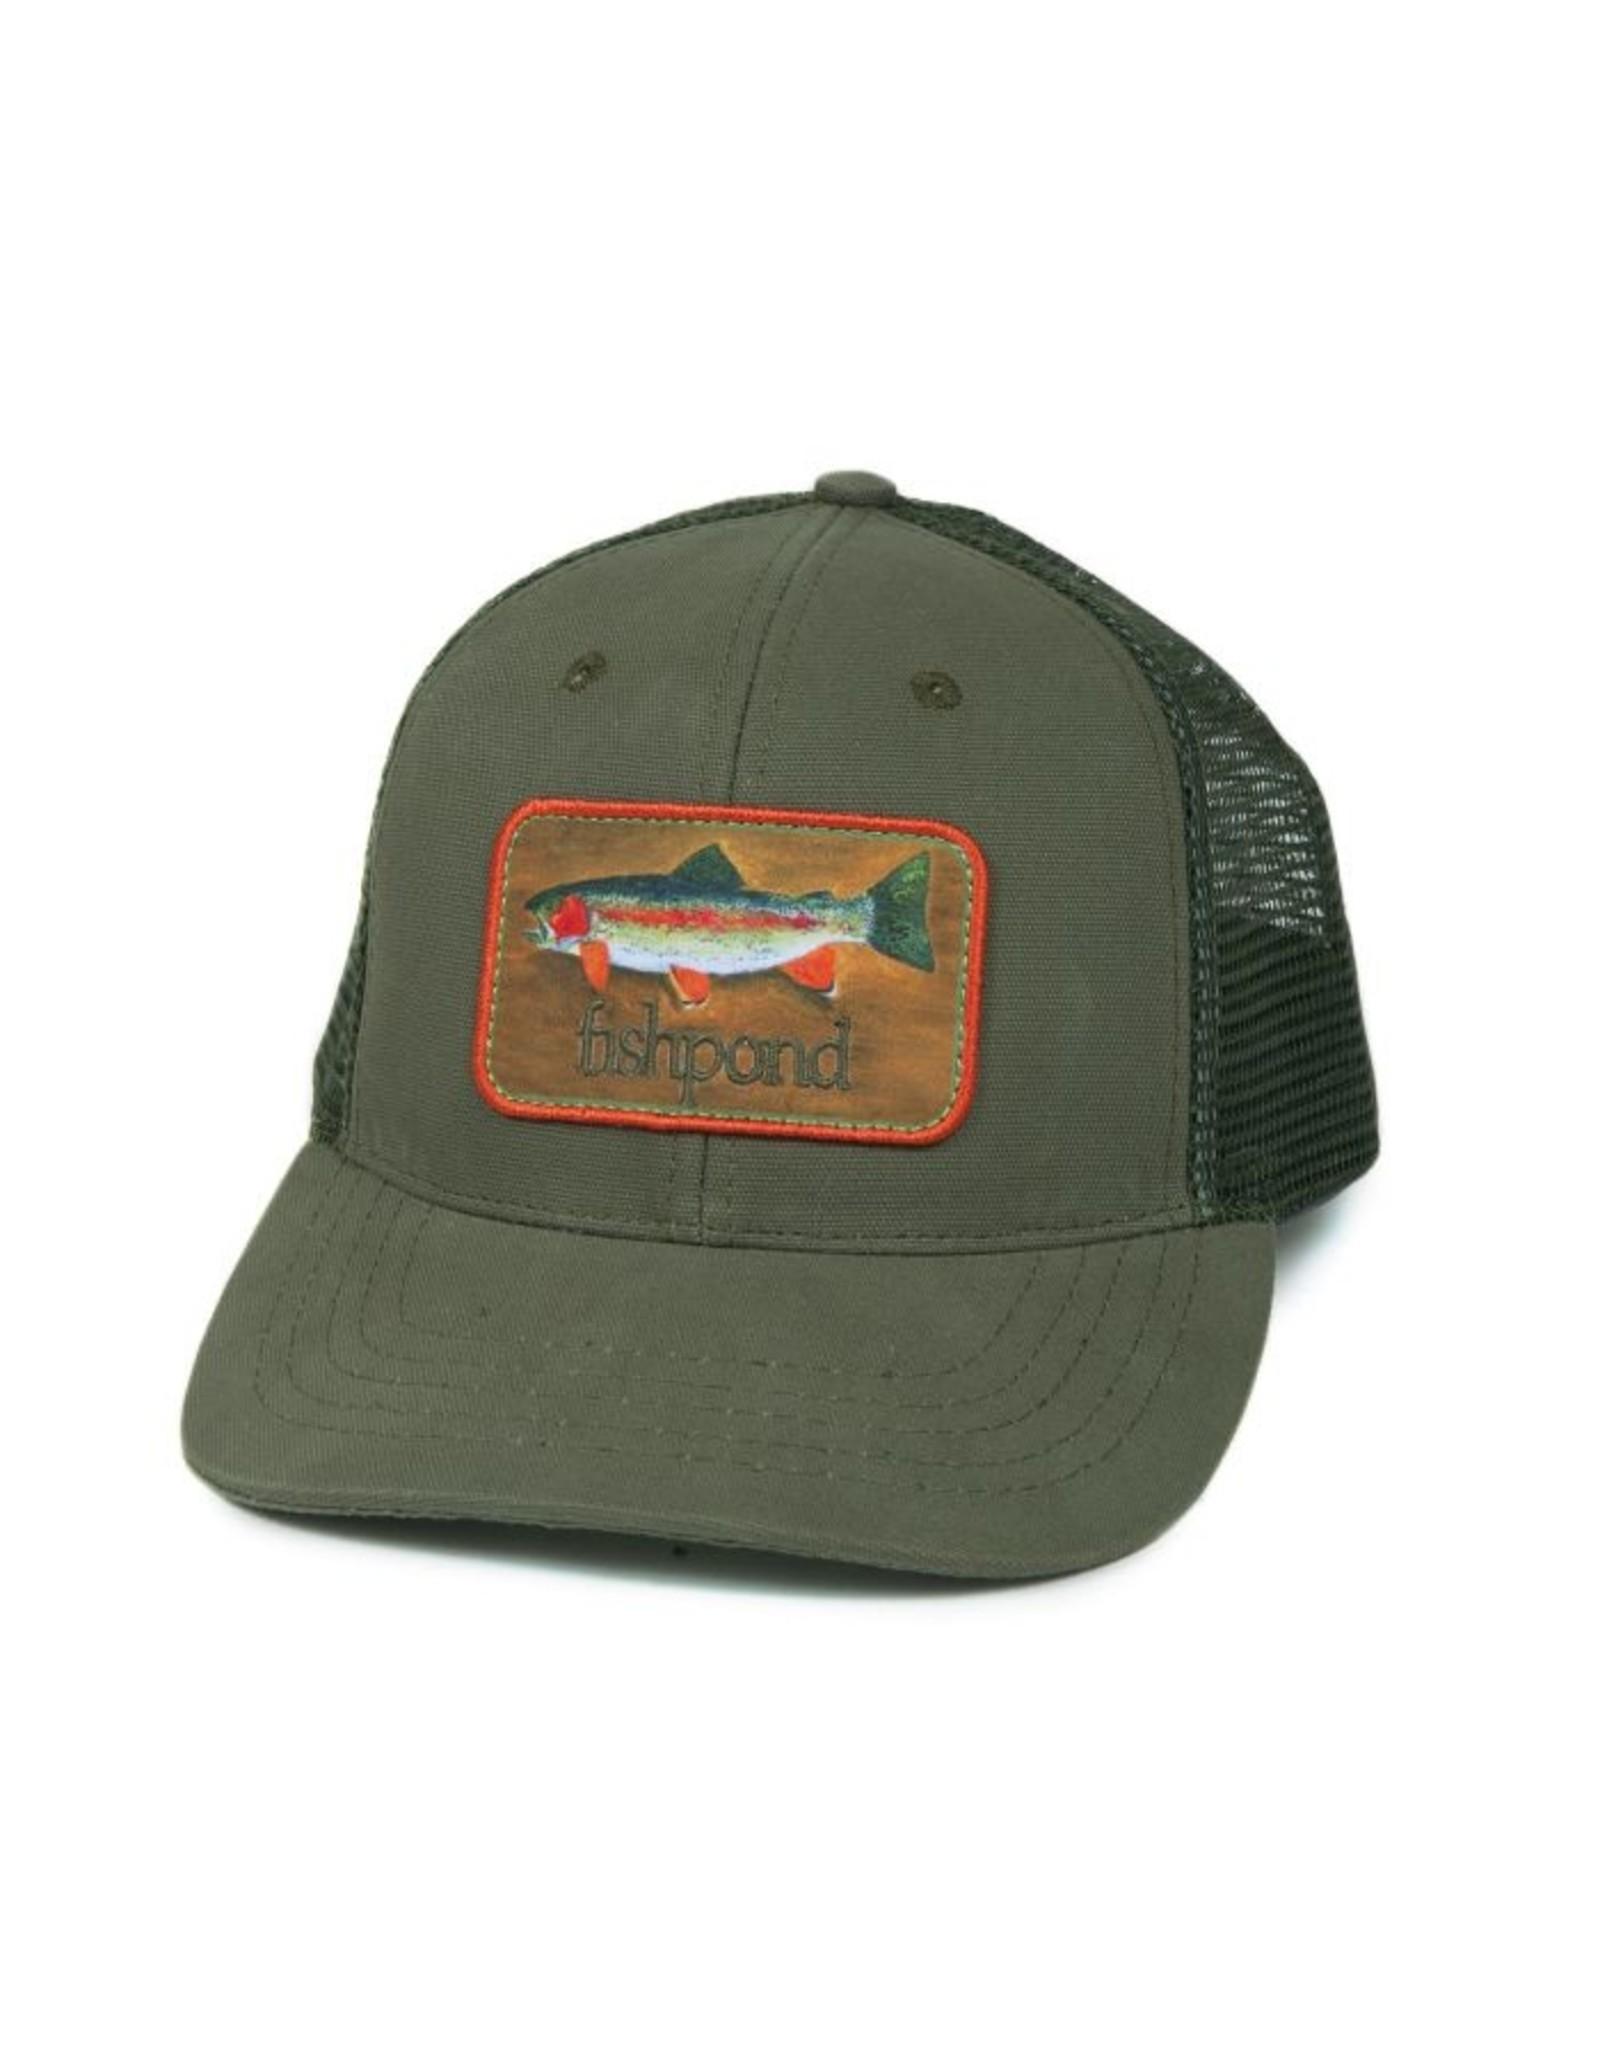 Fishpond Fishpond - Rainbow Trout Hat - Olive